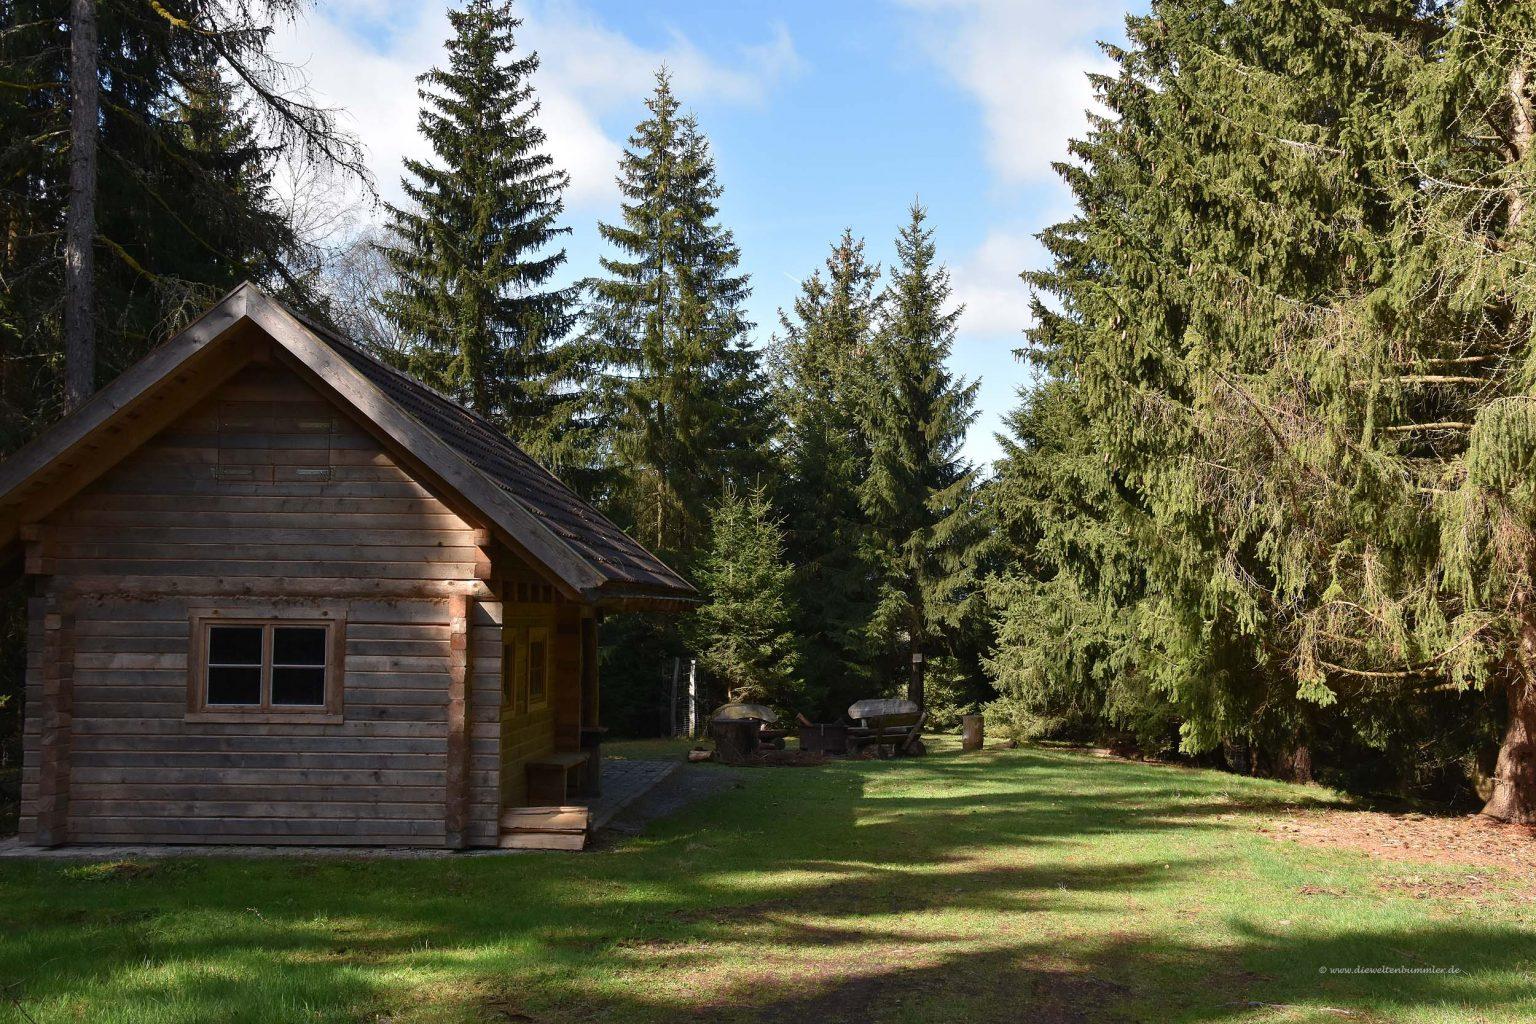 Wanderhütte auf dem Kapitelsberg